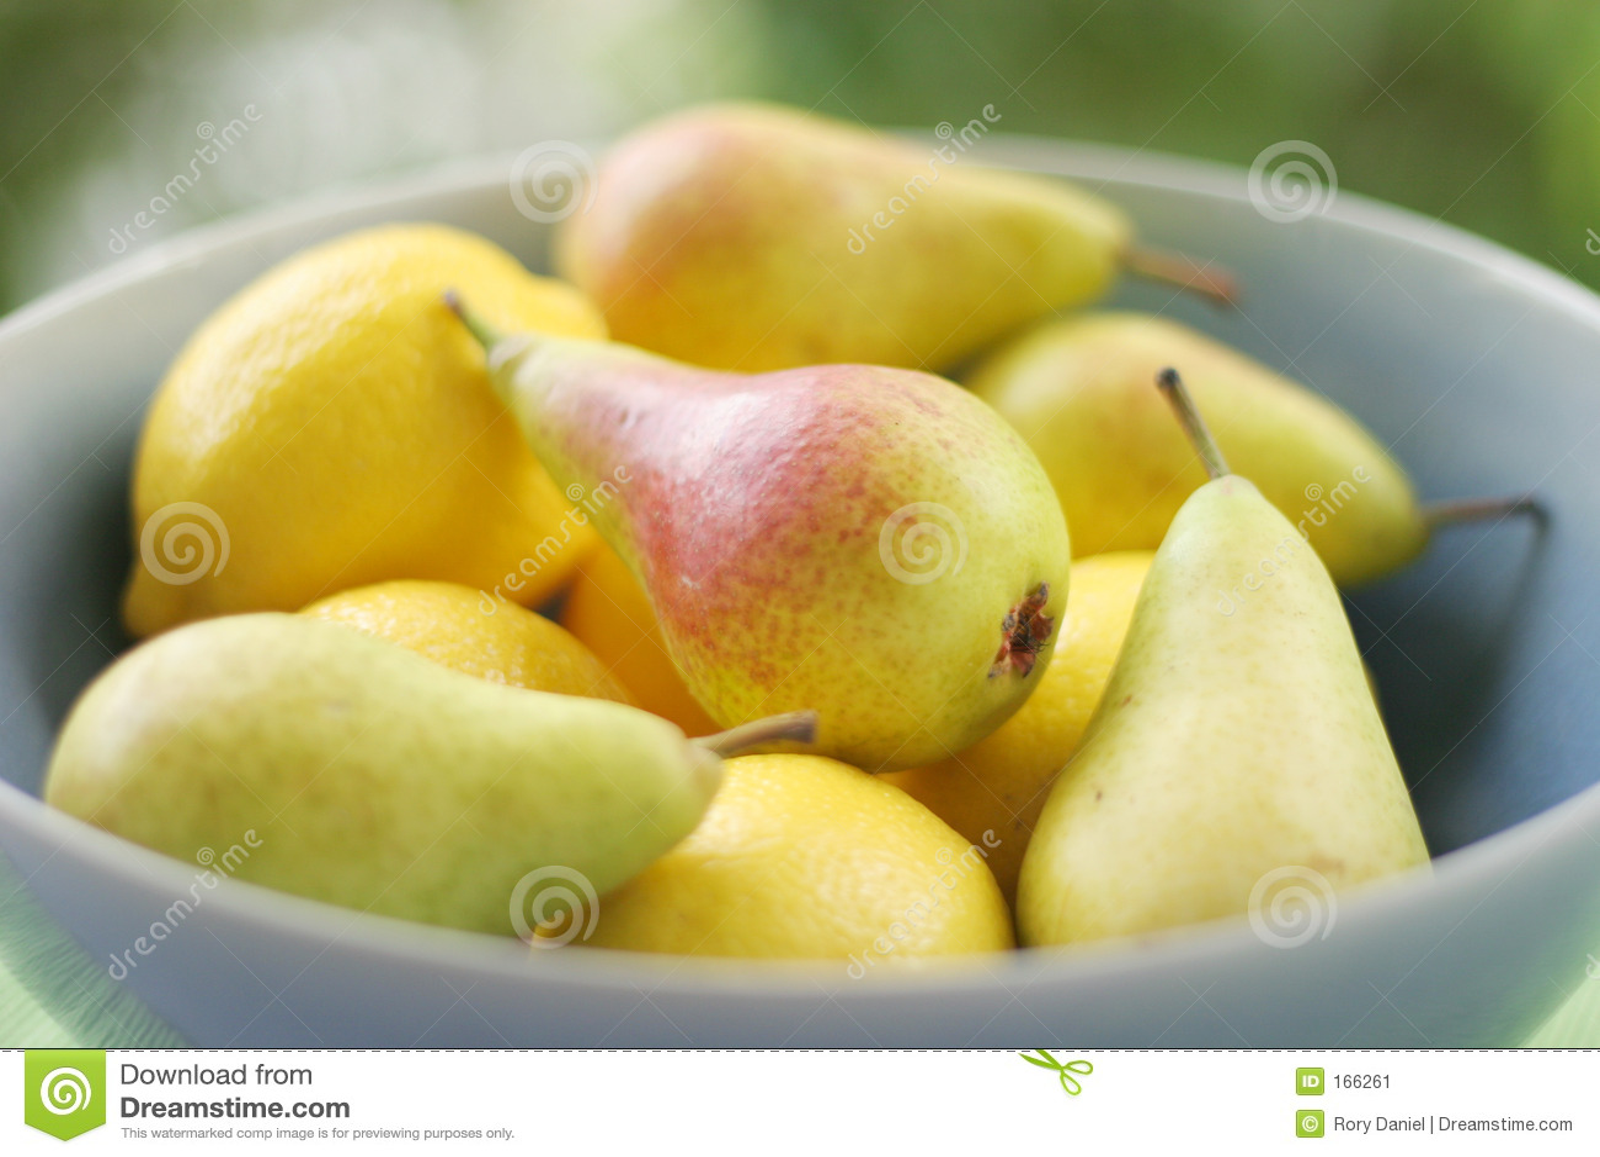 Lemons & Pears